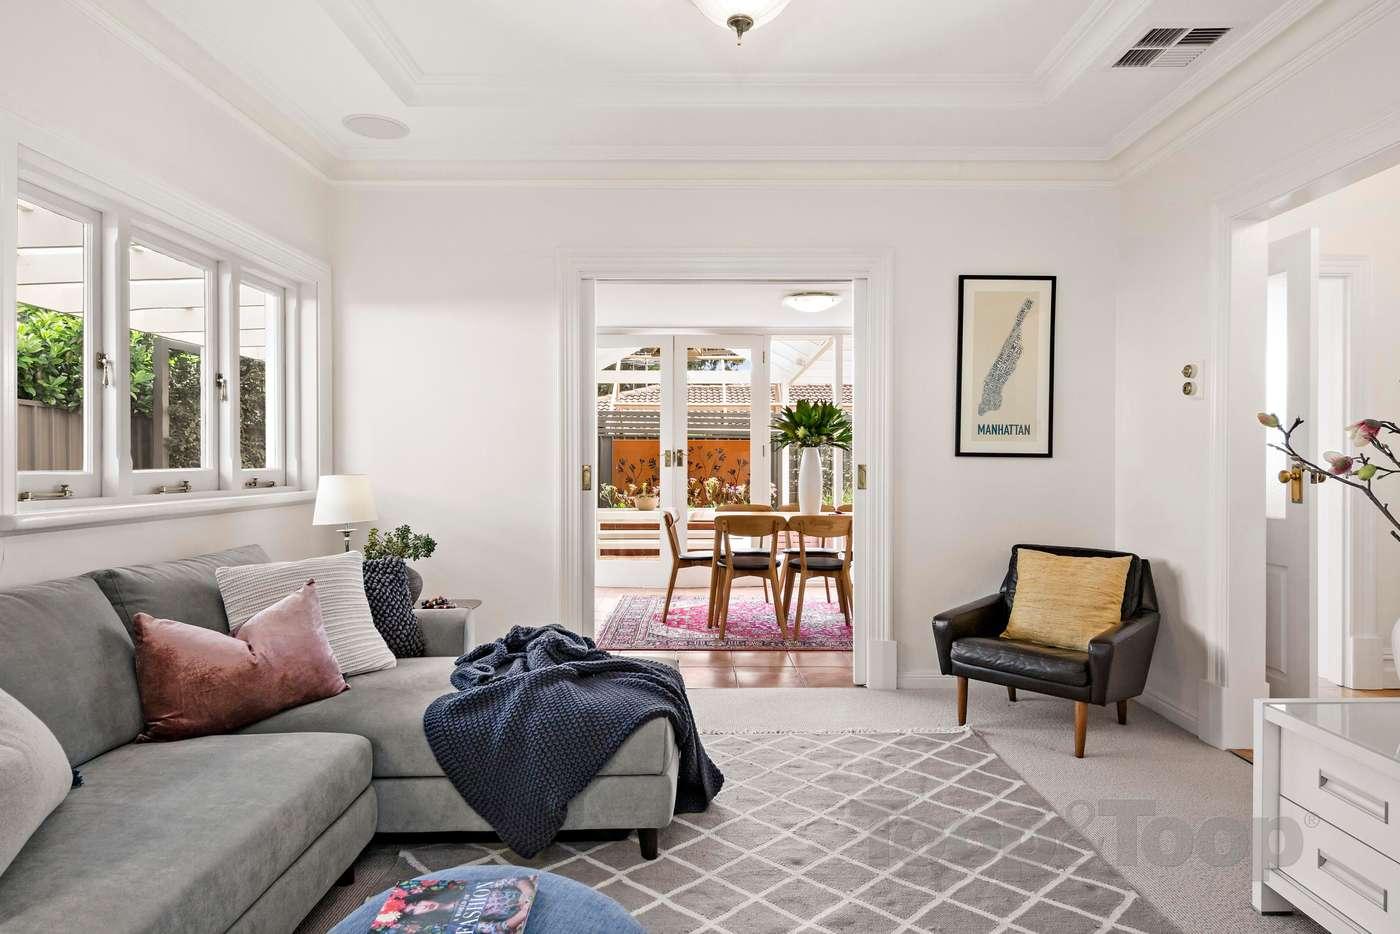 Main view of Homely house listing, 6 Sunnymeade Avenue, Fullarton SA 5063